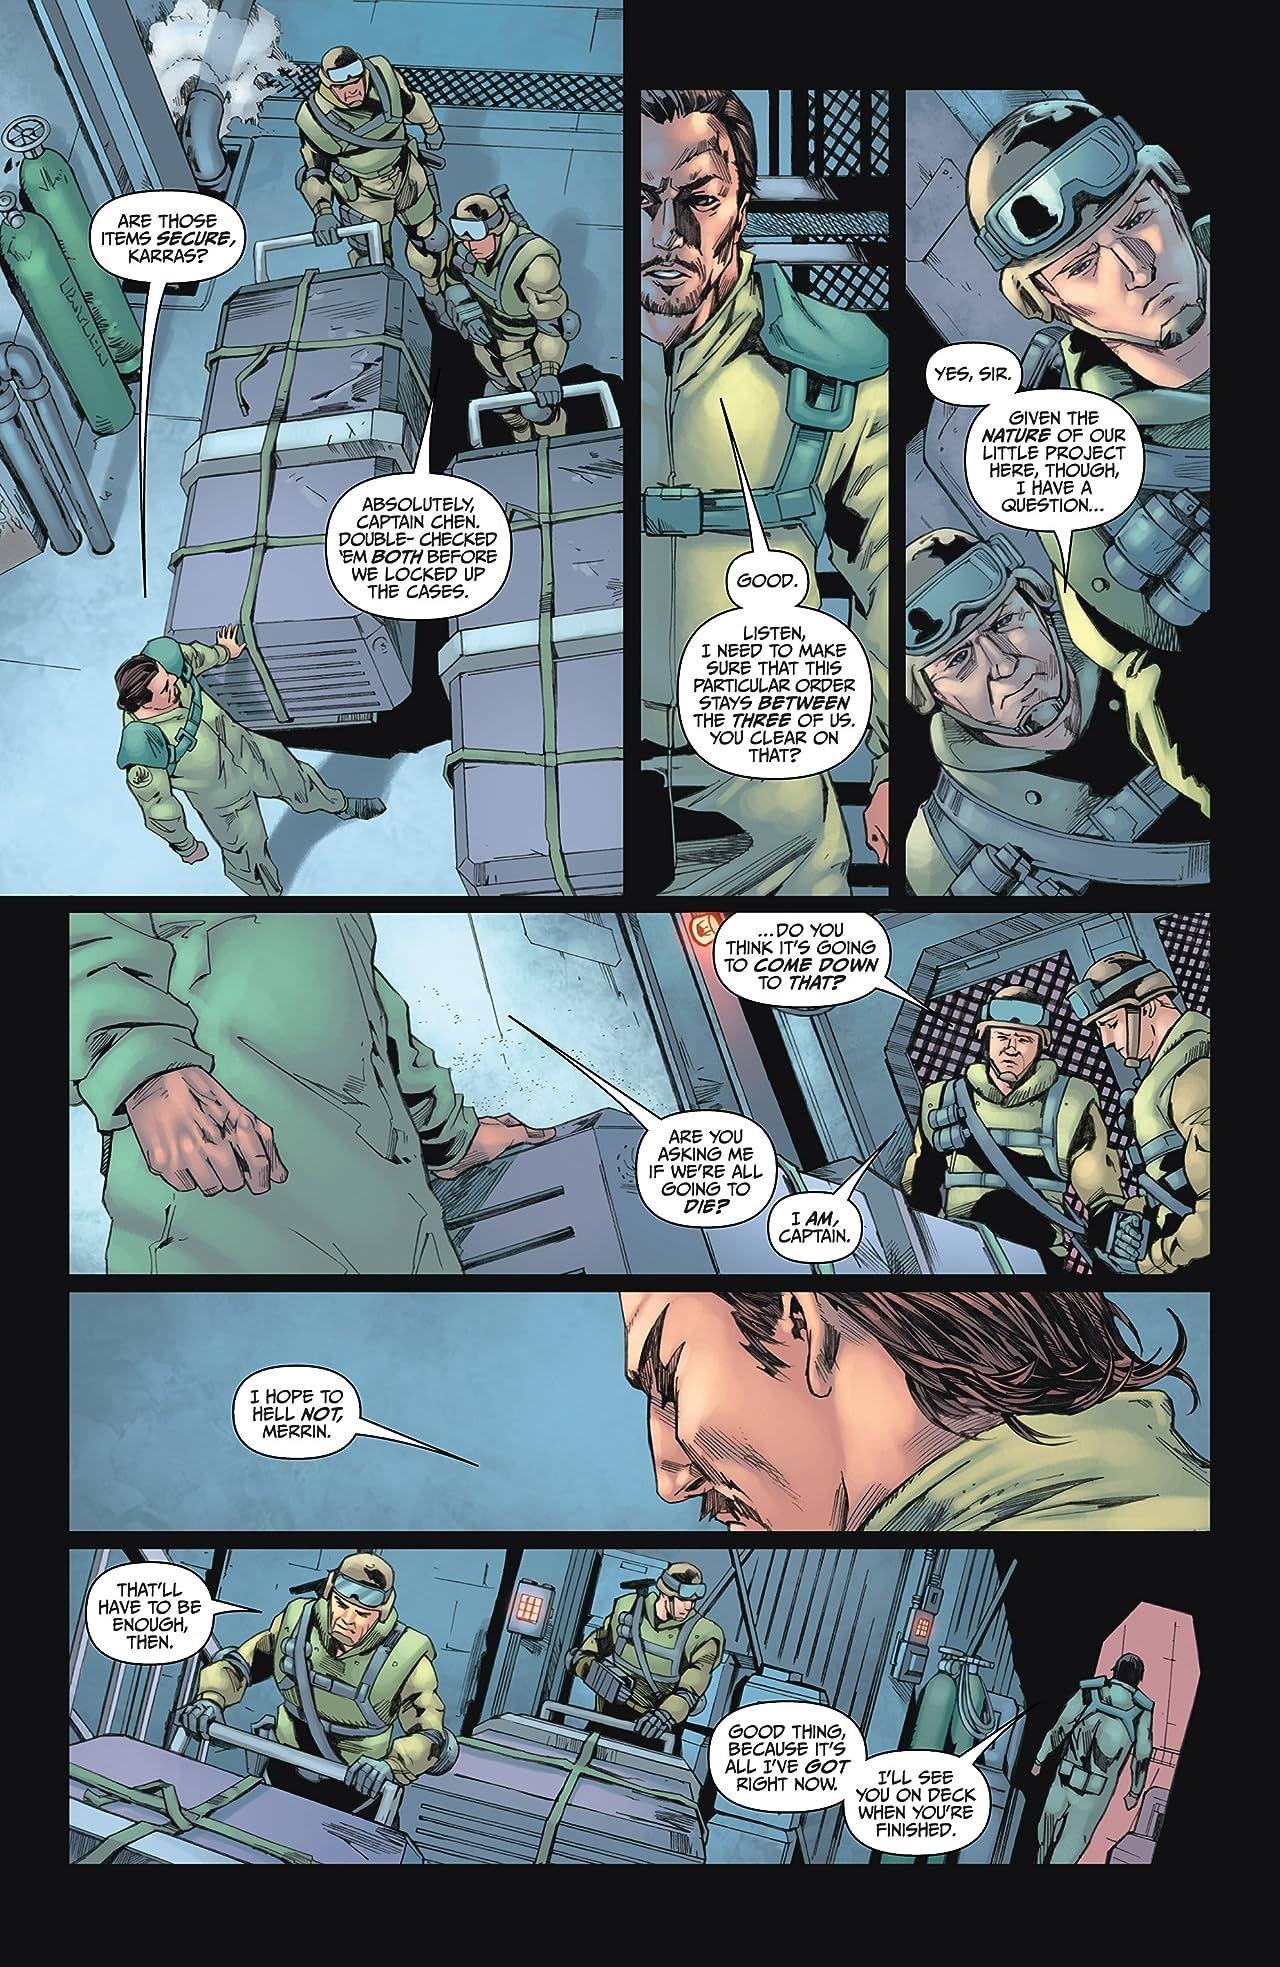 Battlestar Galactica #4 (of 4): Ghosts